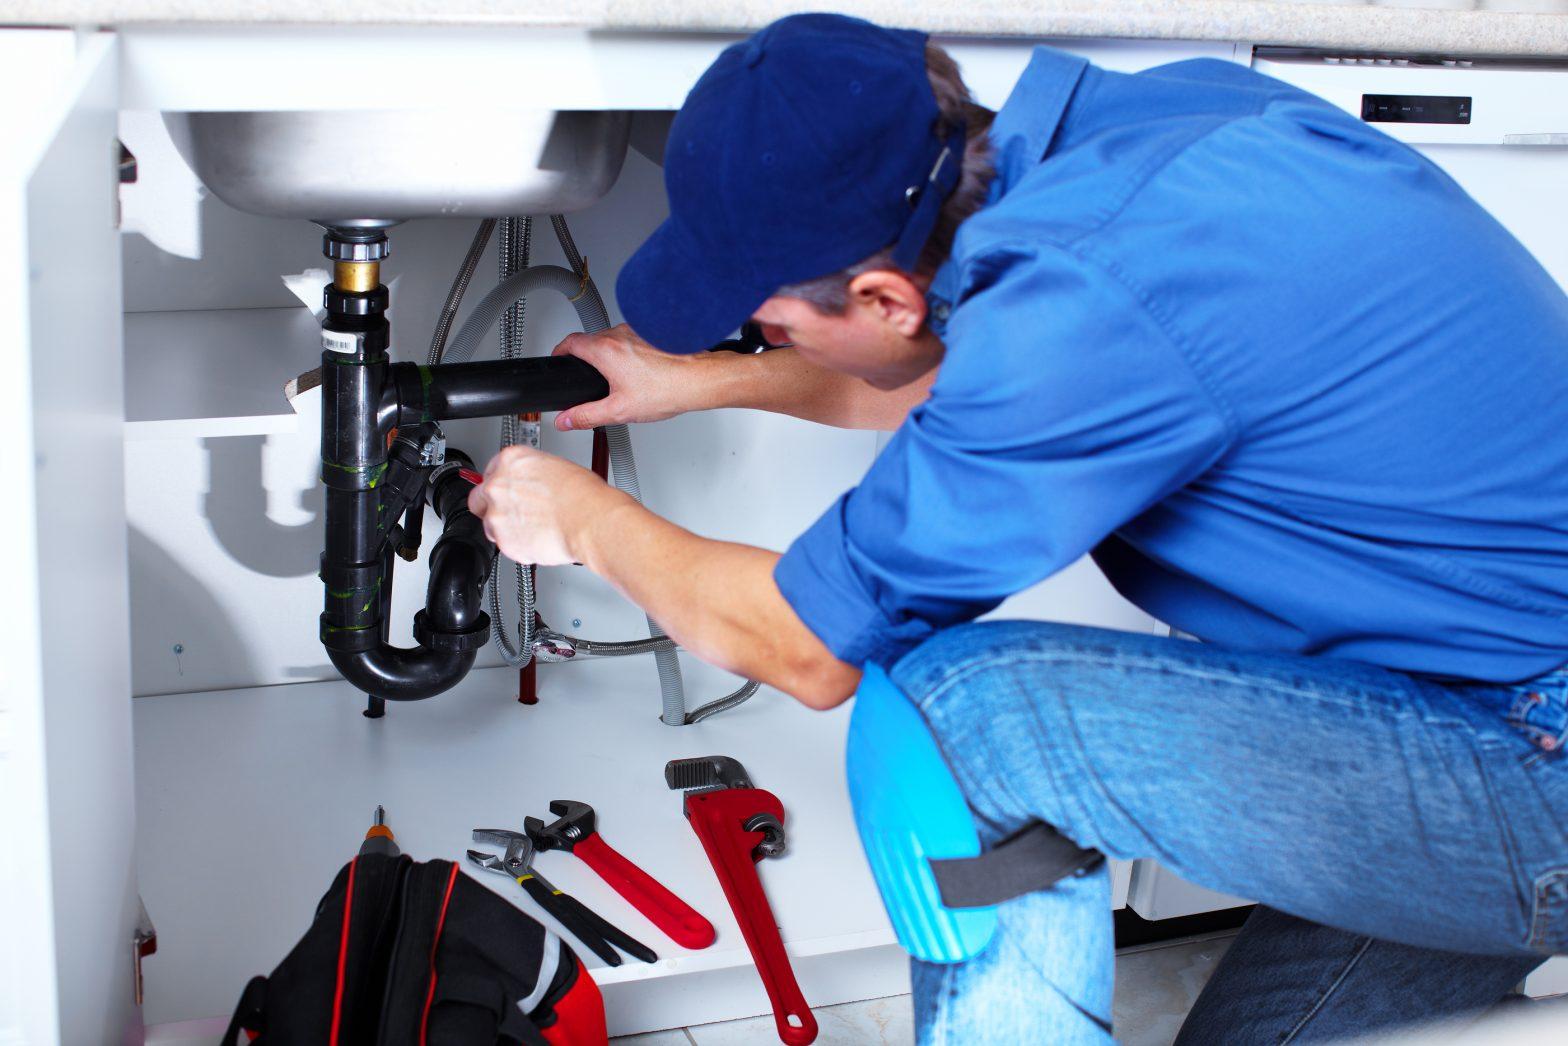 Getting Regular Scheduled Checks Can Extend Your Plumbing's Lifespan